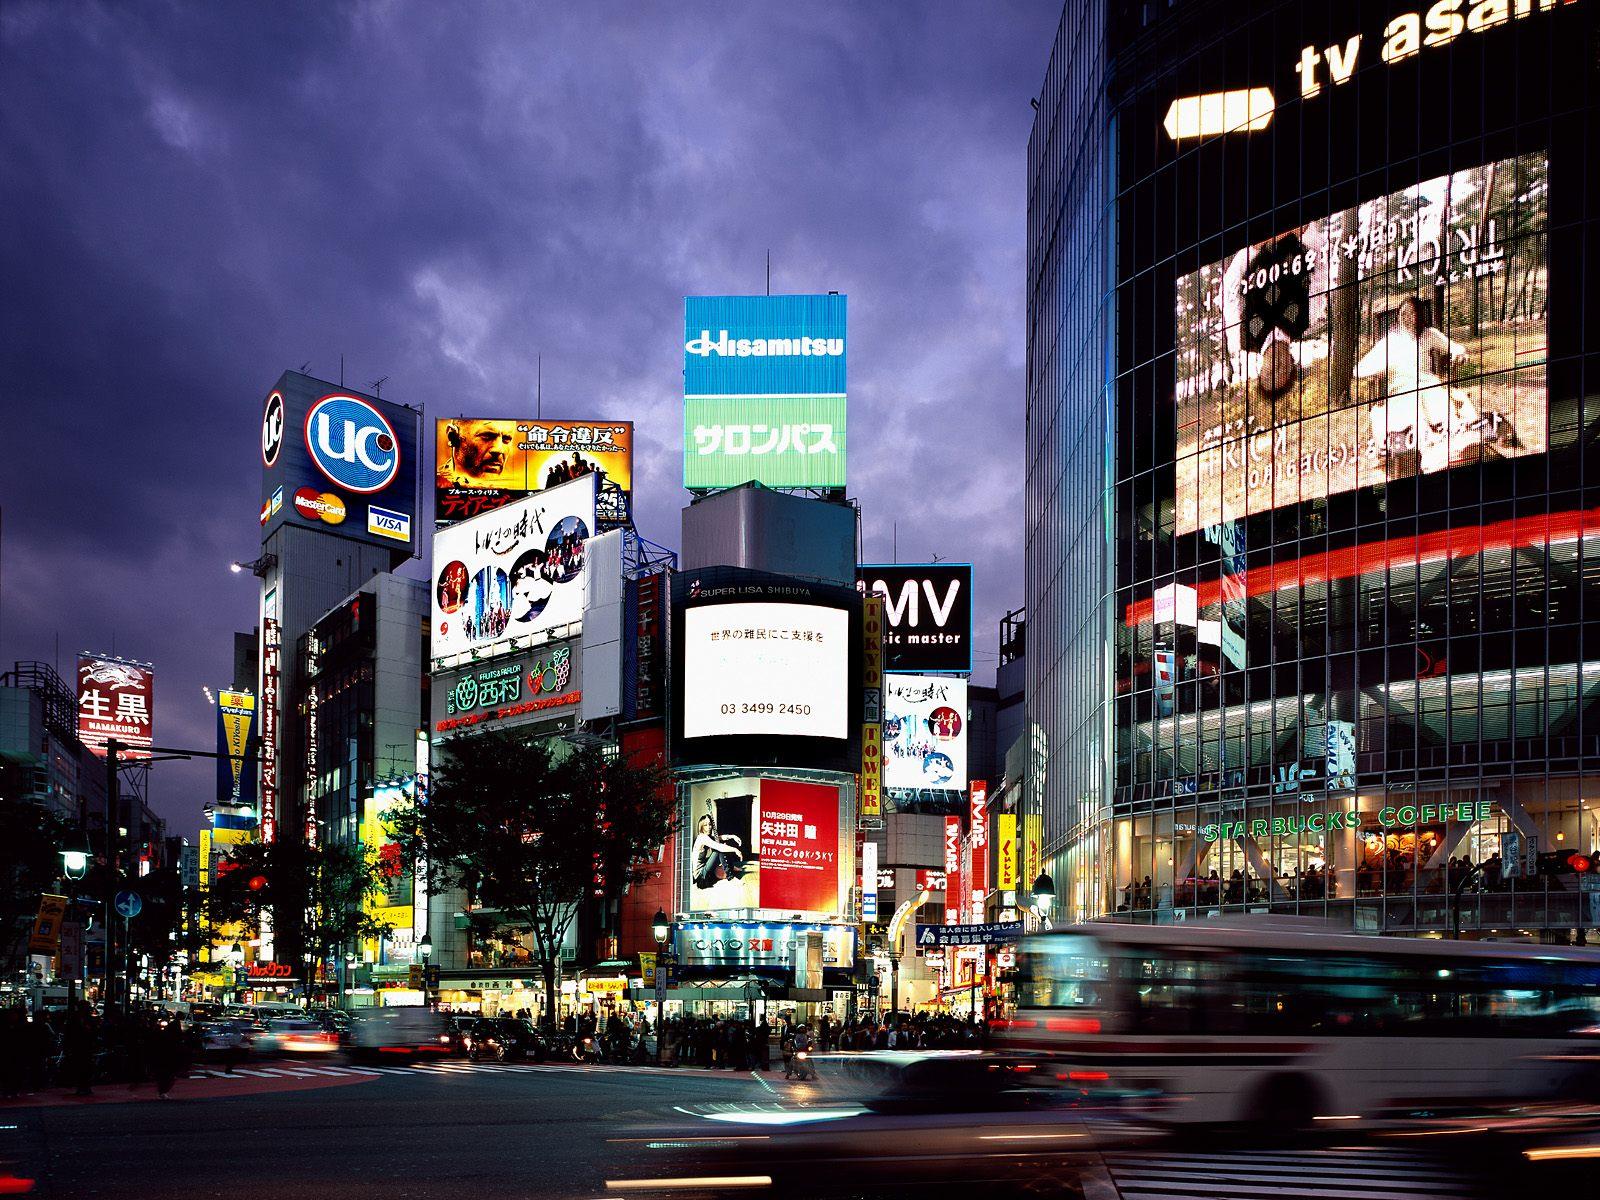 Shibuya Tokyo Japan photo or wallpaper